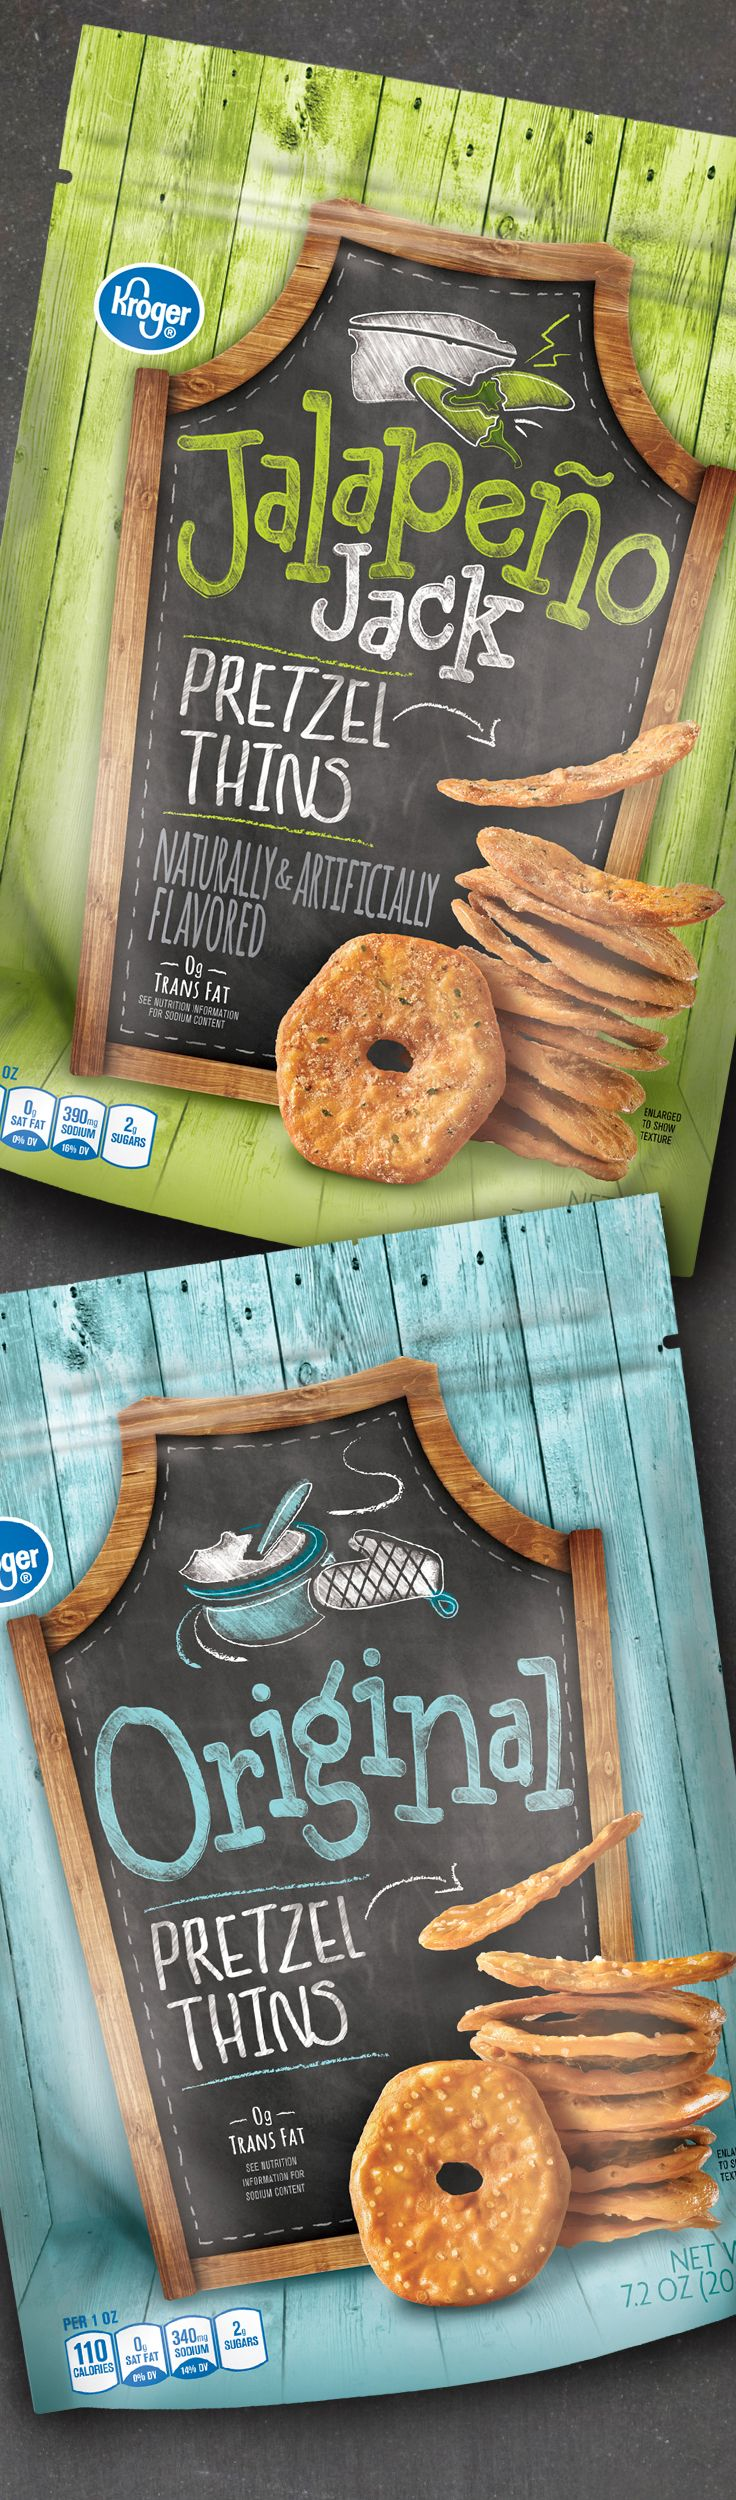 Pretzel Thins - Packaging designed by Design Resource Center…